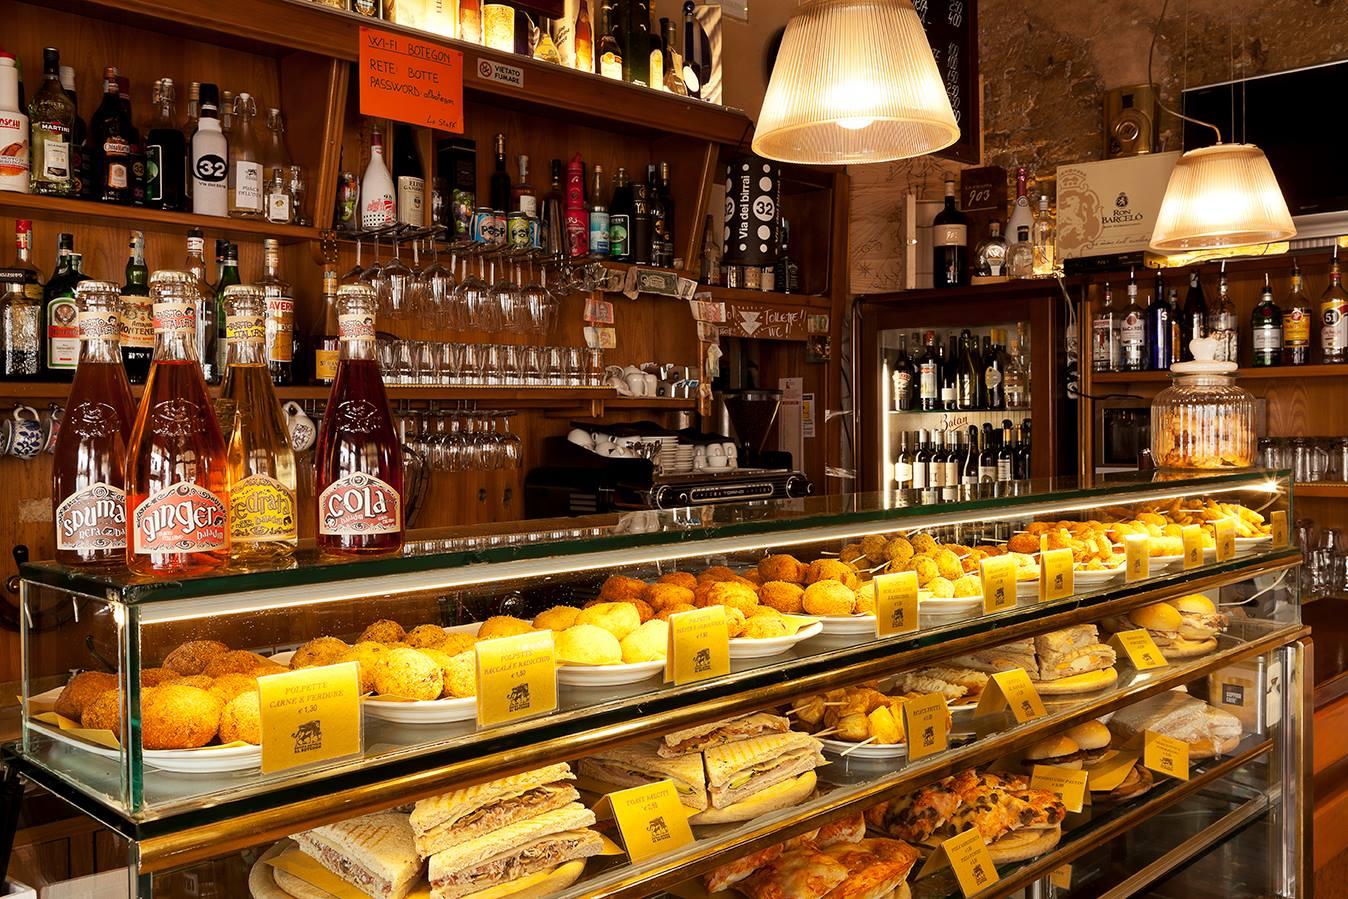 Osteria Treviso Botegon Osteria Treviso Botegon